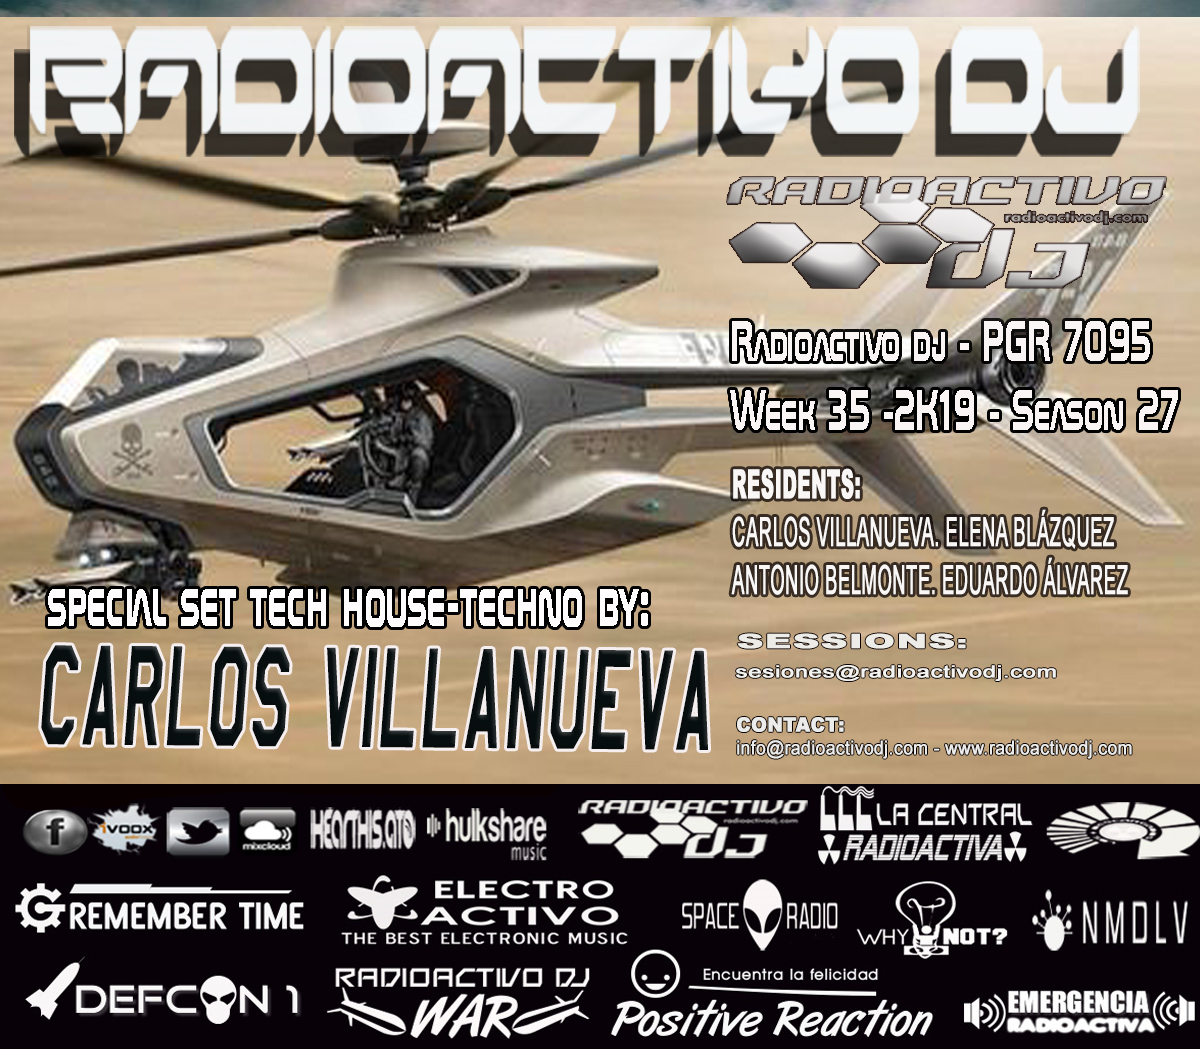 RADIOACTIVO-DJ-35-2019